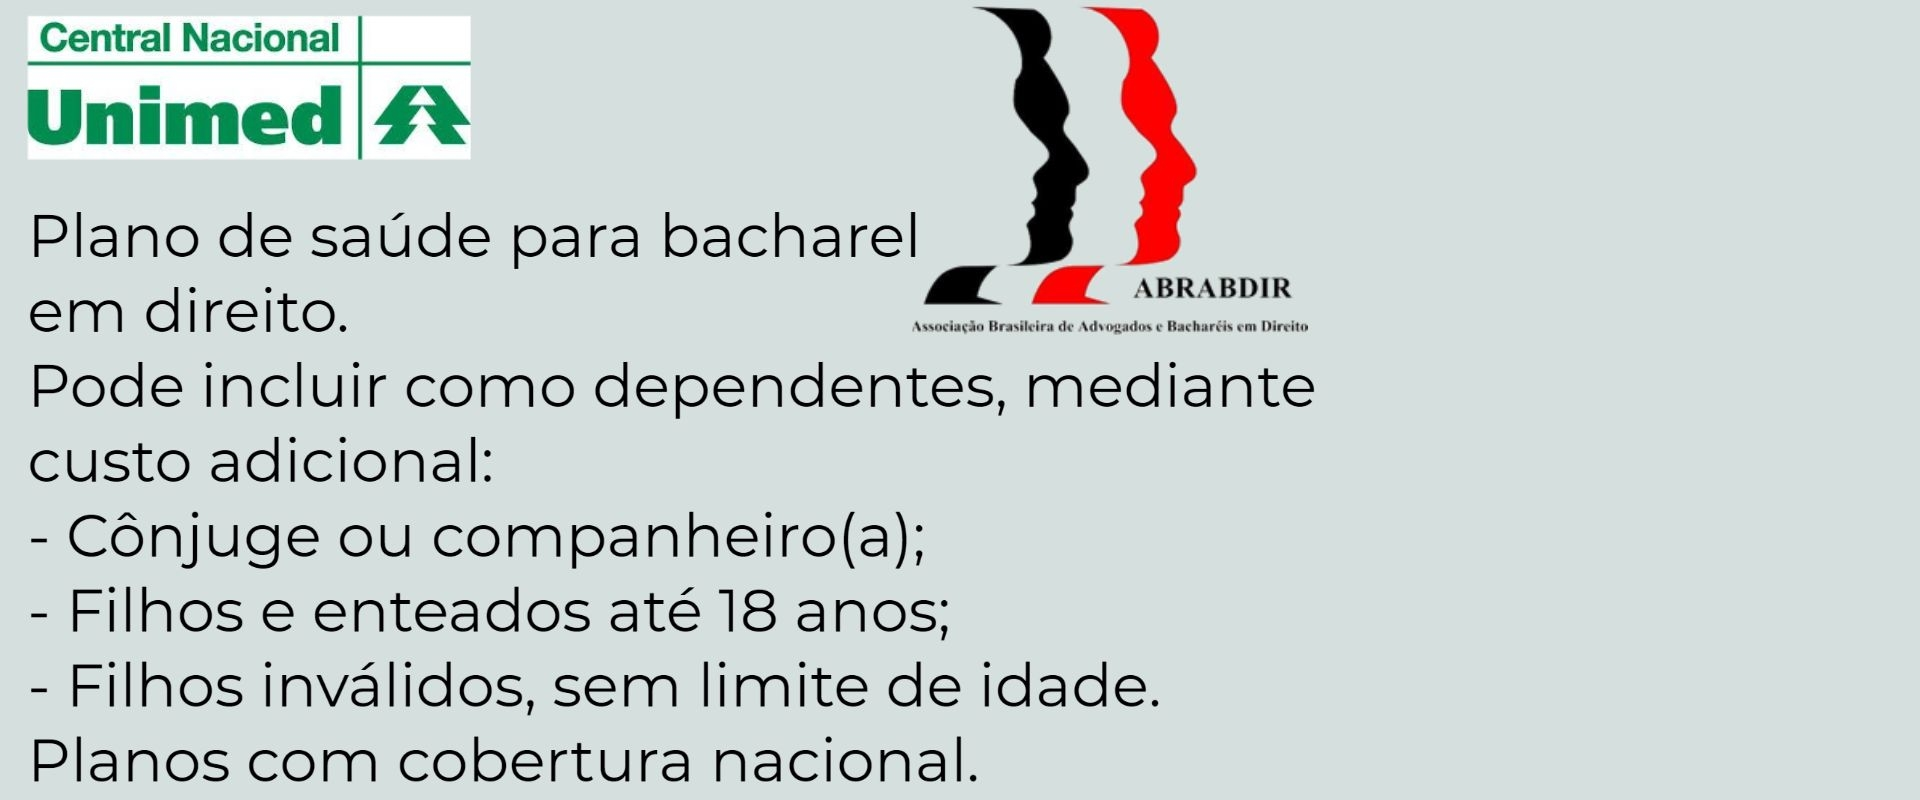 Unimed ABRABDIR Ferraz de Vasconcelos